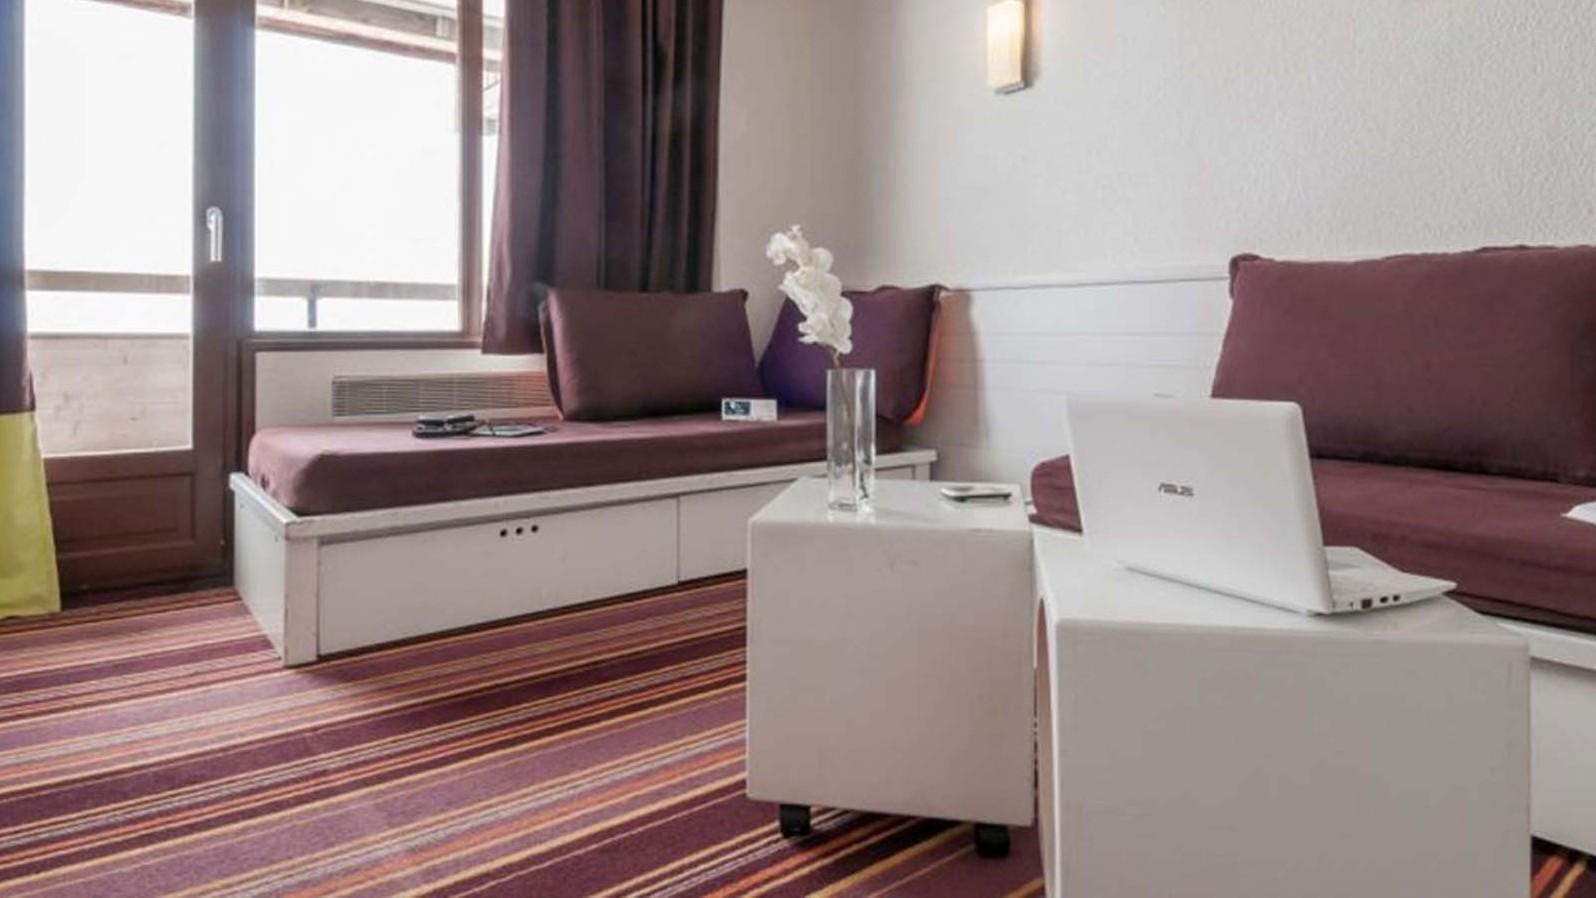 Apartment Interior, Residence Antares, Avoriaz, France